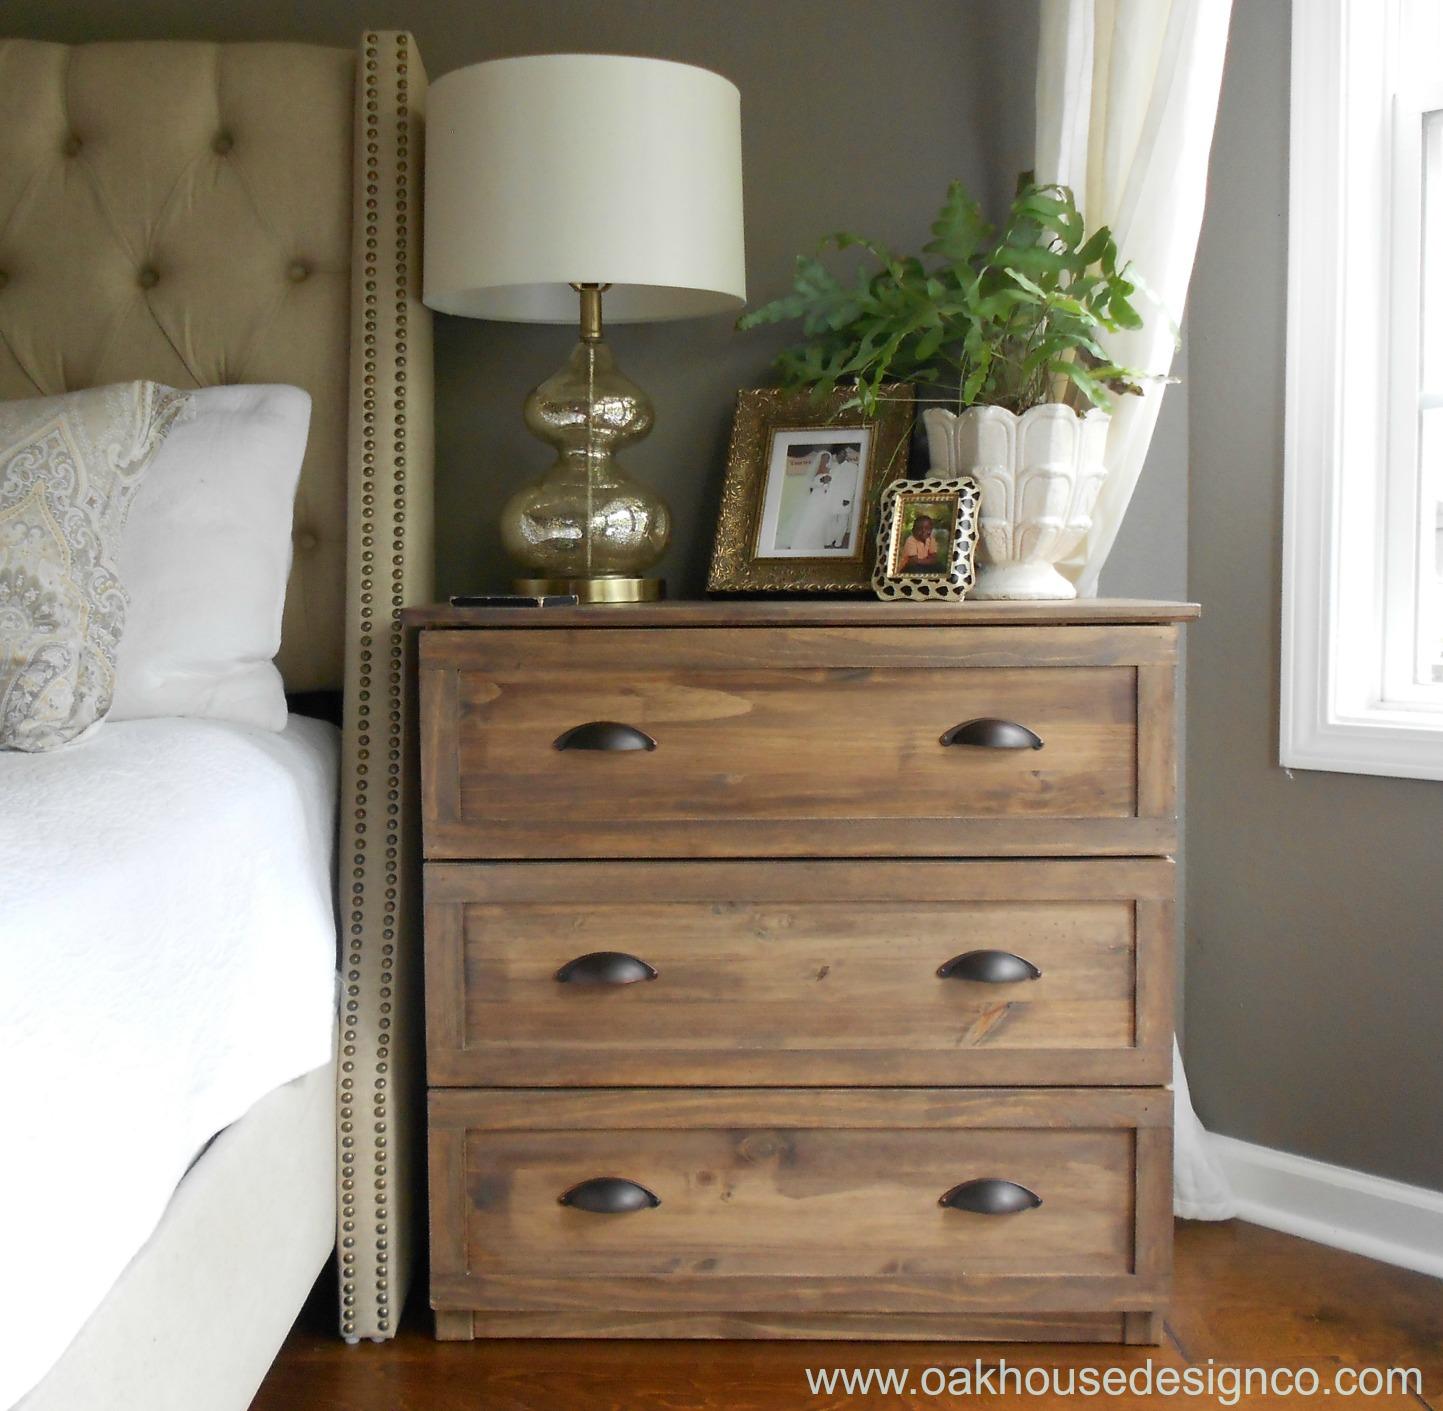 the new nightstands an ikea tarva hack oak house design co. Black Bedroom Furniture Sets. Home Design Ideas